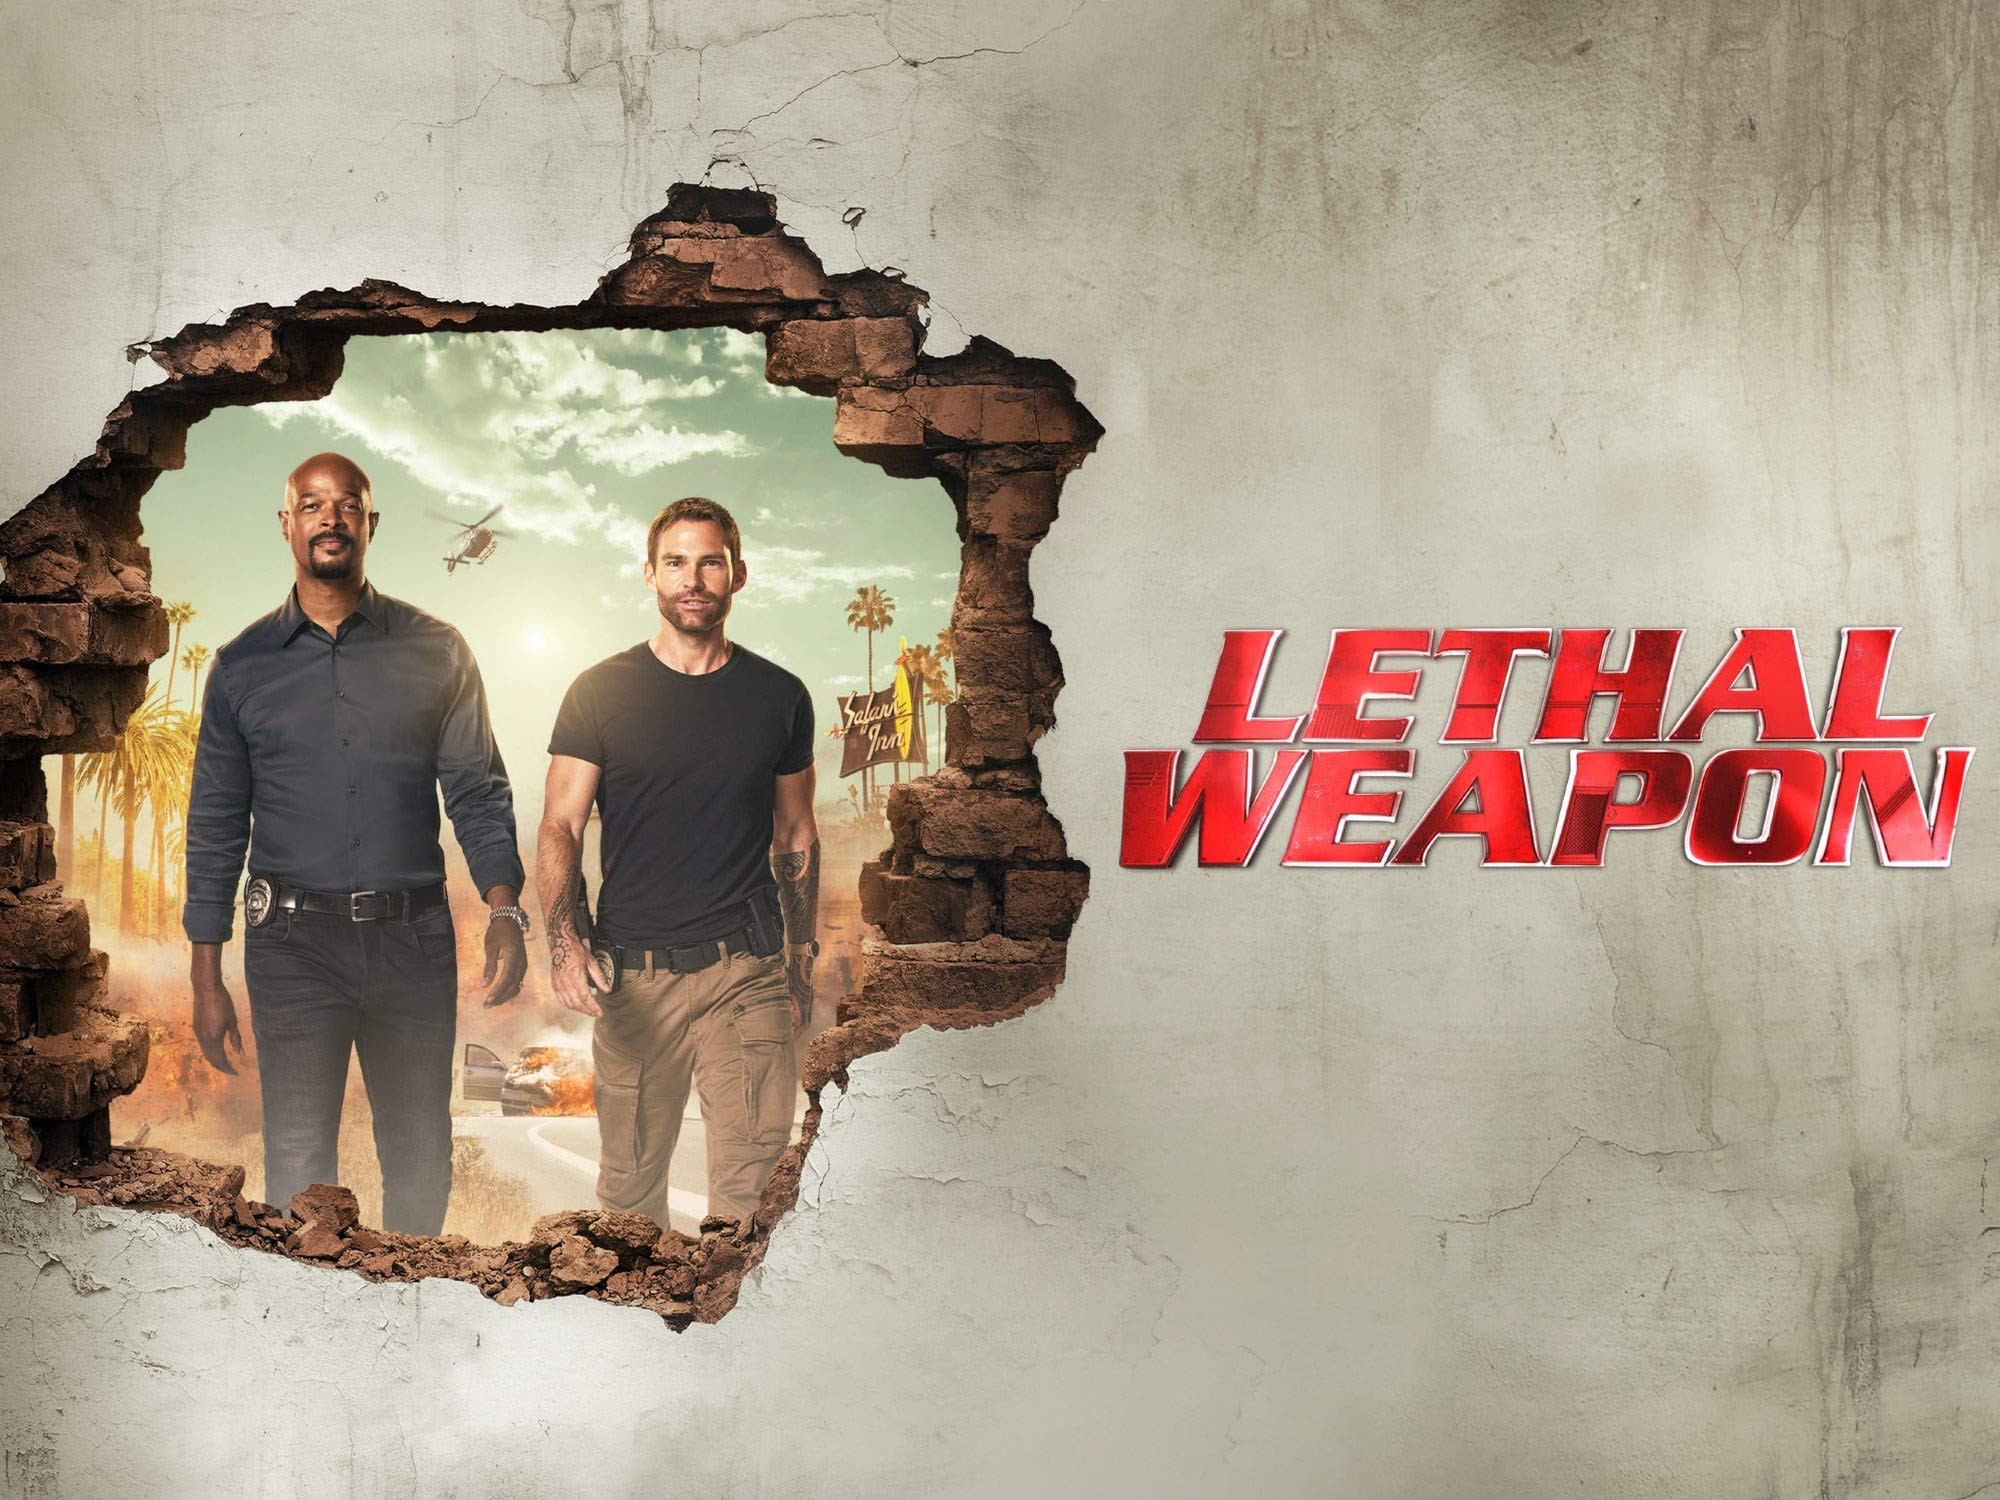 Lethal Weapon Staffel 2 Amazon Prime